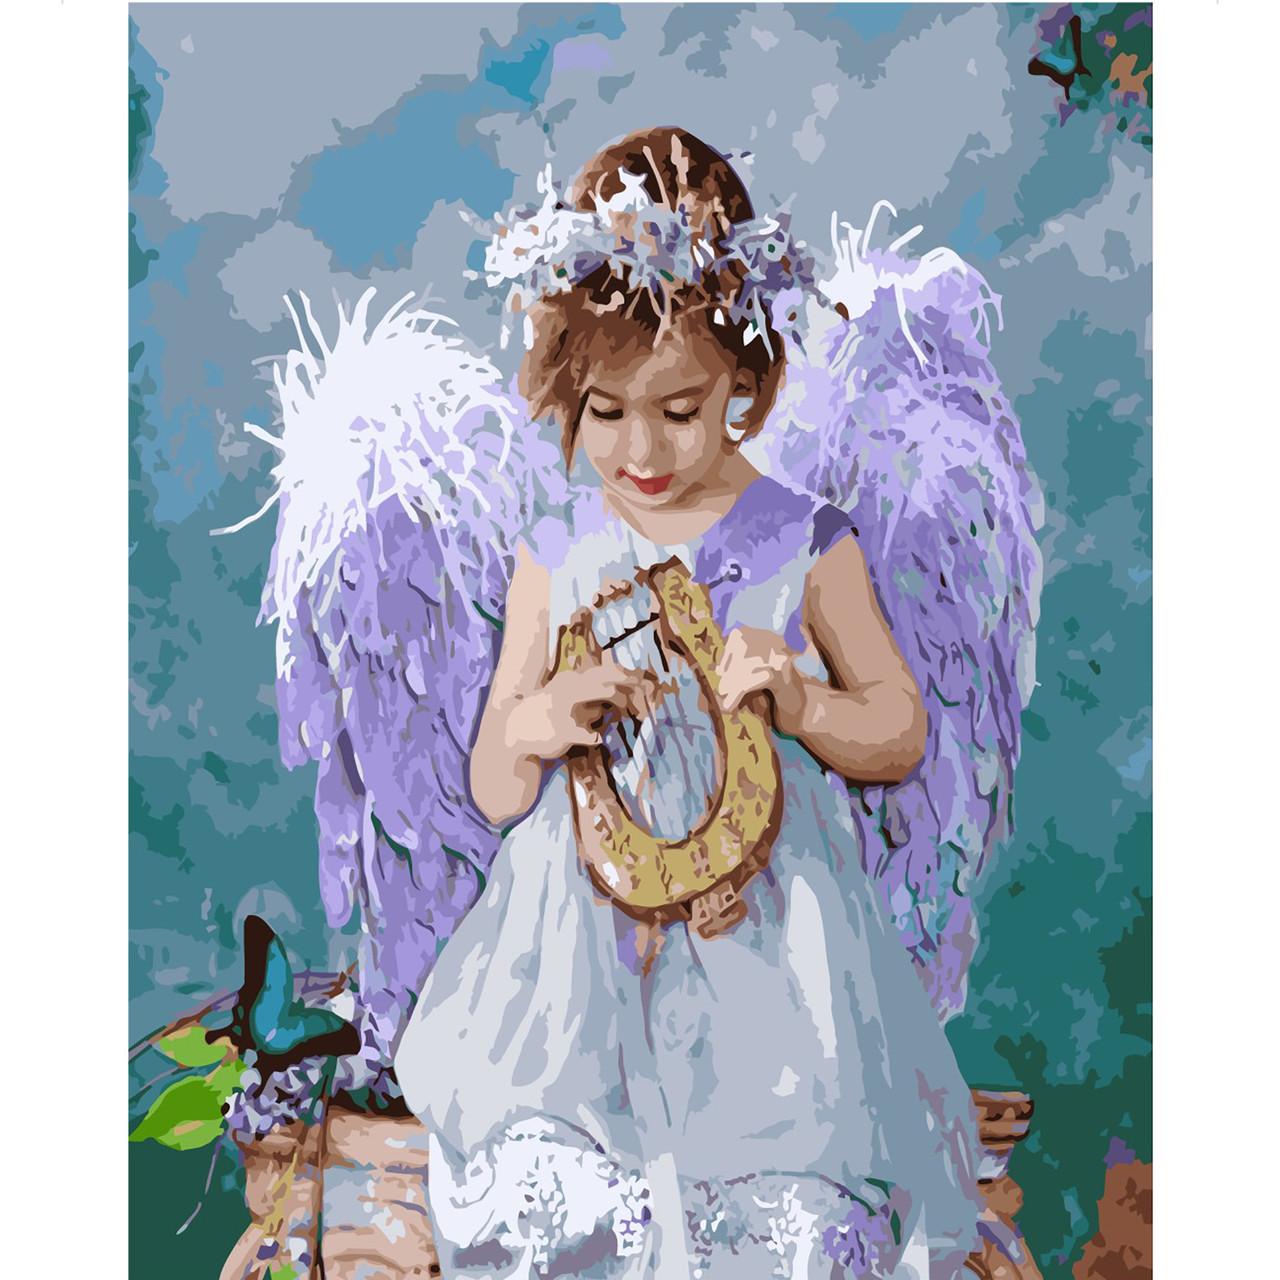 Картина по номерам VA-1982 Девочка ангел, 40х50 см Strateg